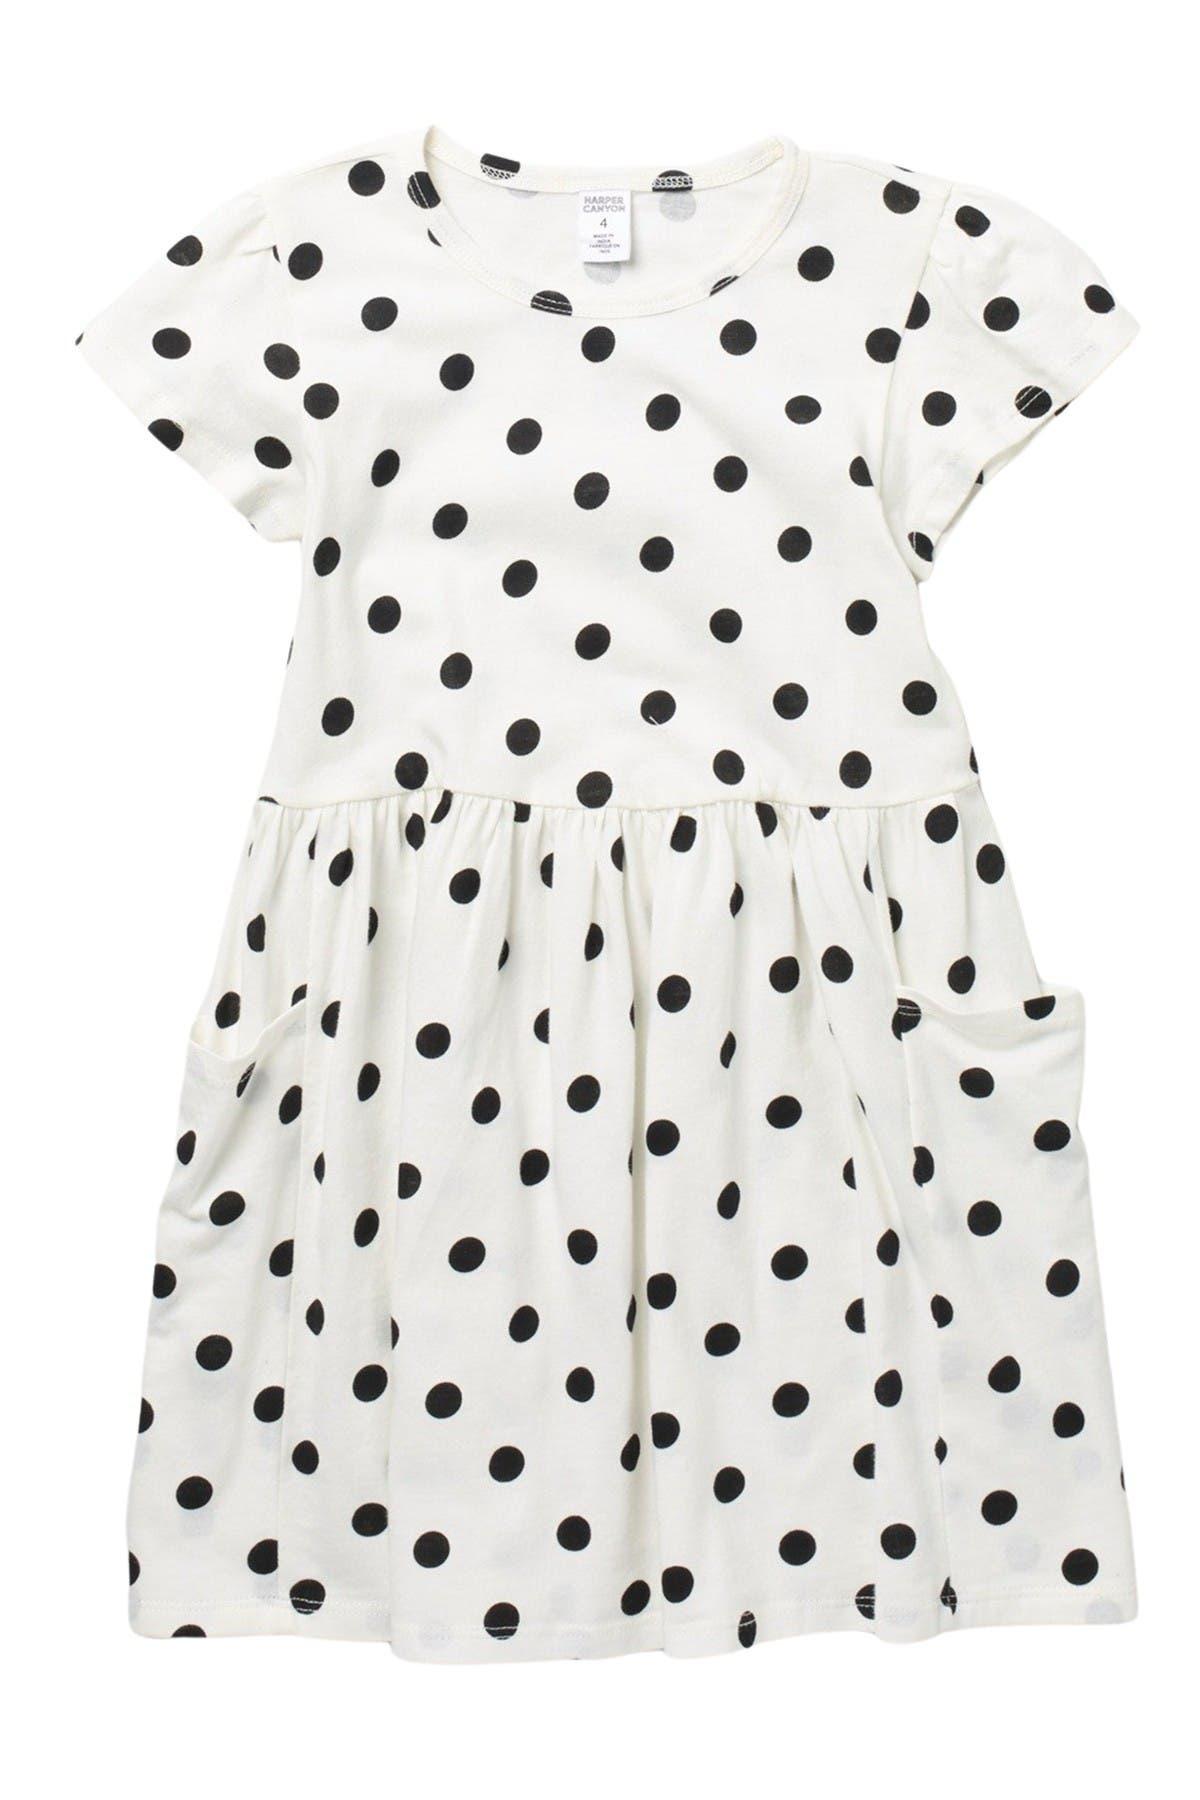 Image of Harper Canyon Pocket T-Shirt Dress